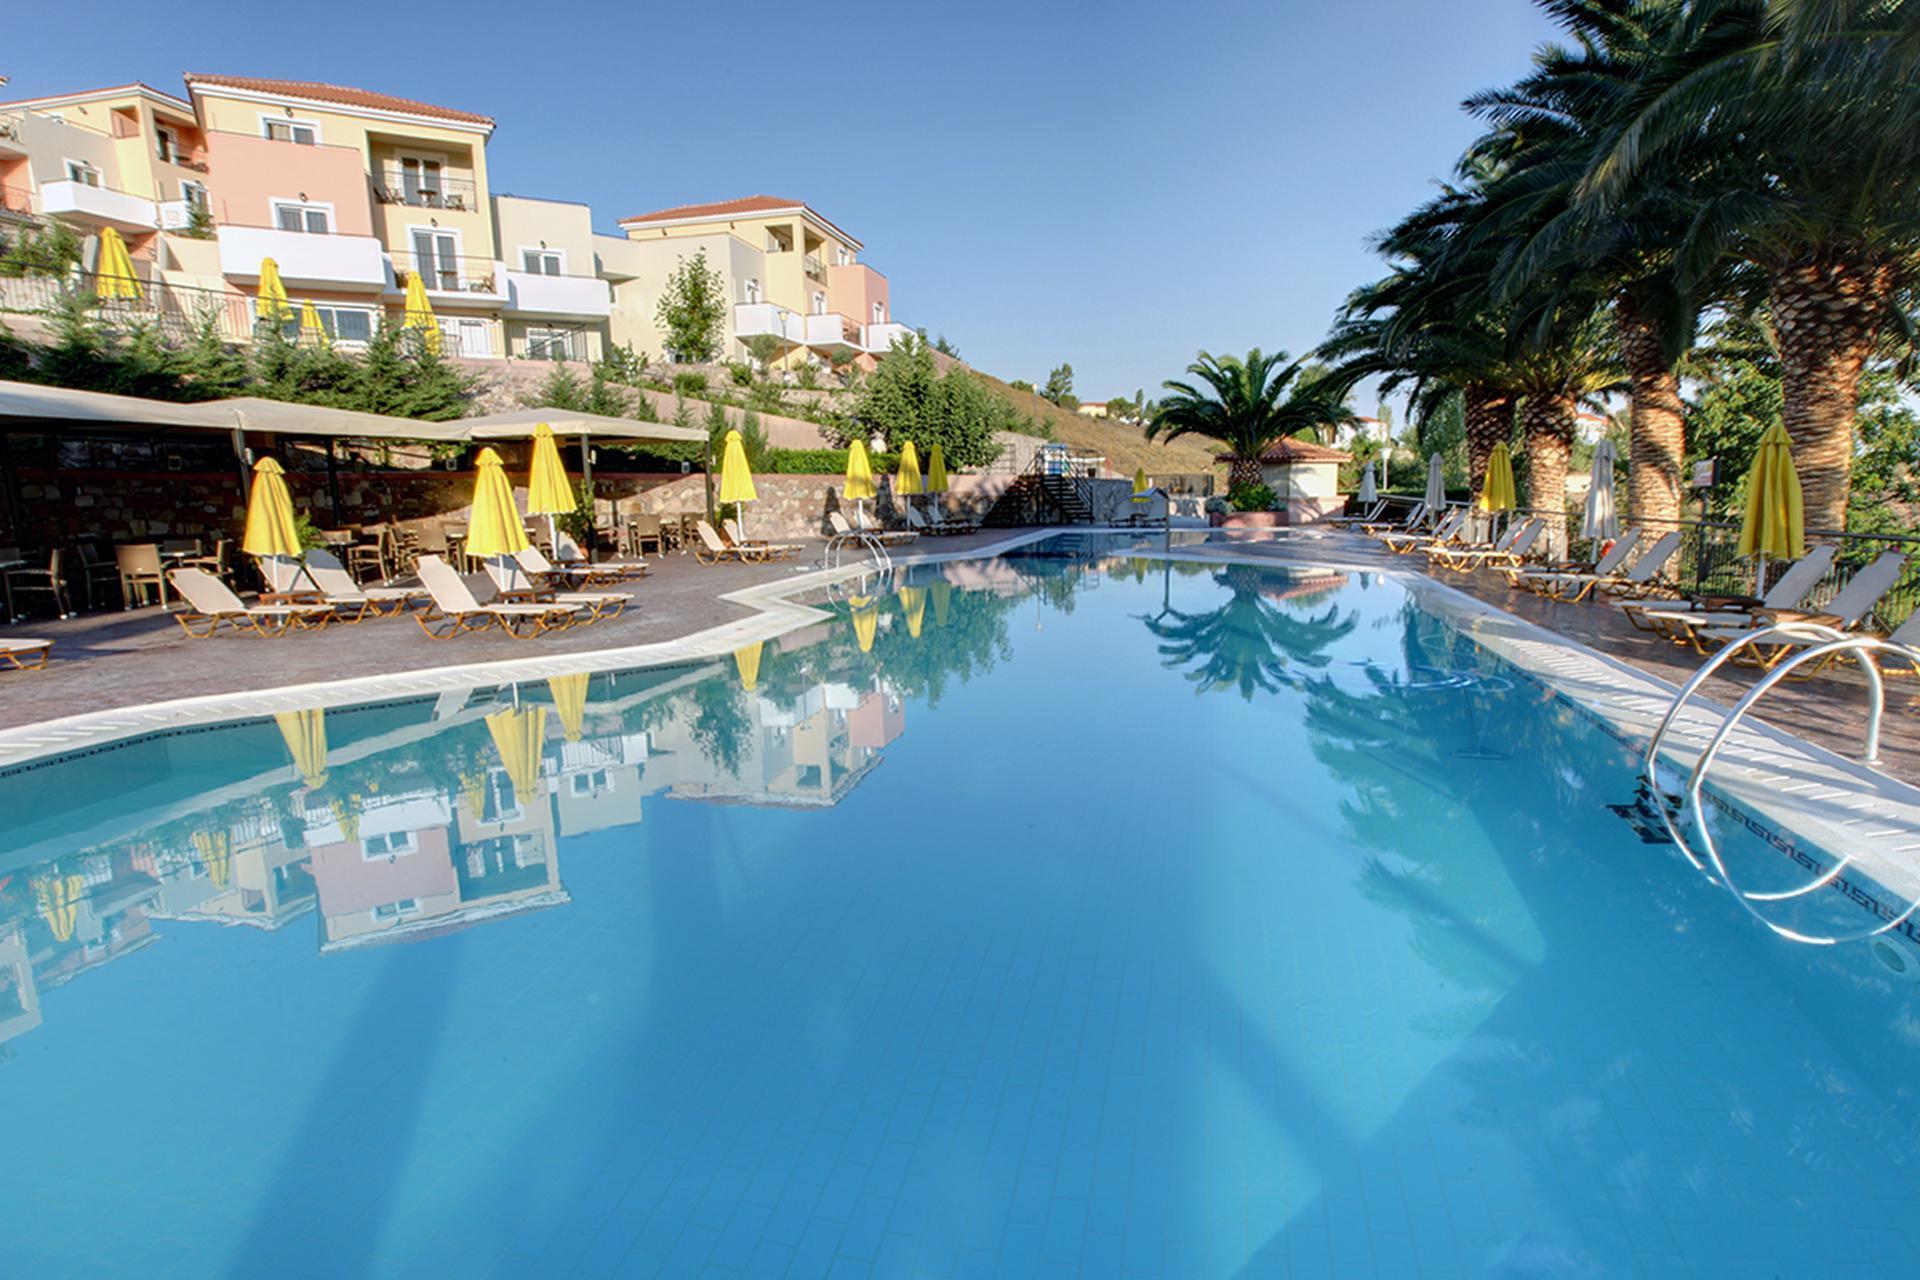 Hotel Sunrise Resort - Halbpension**** - Lesbos, Griechenland   Sunweb